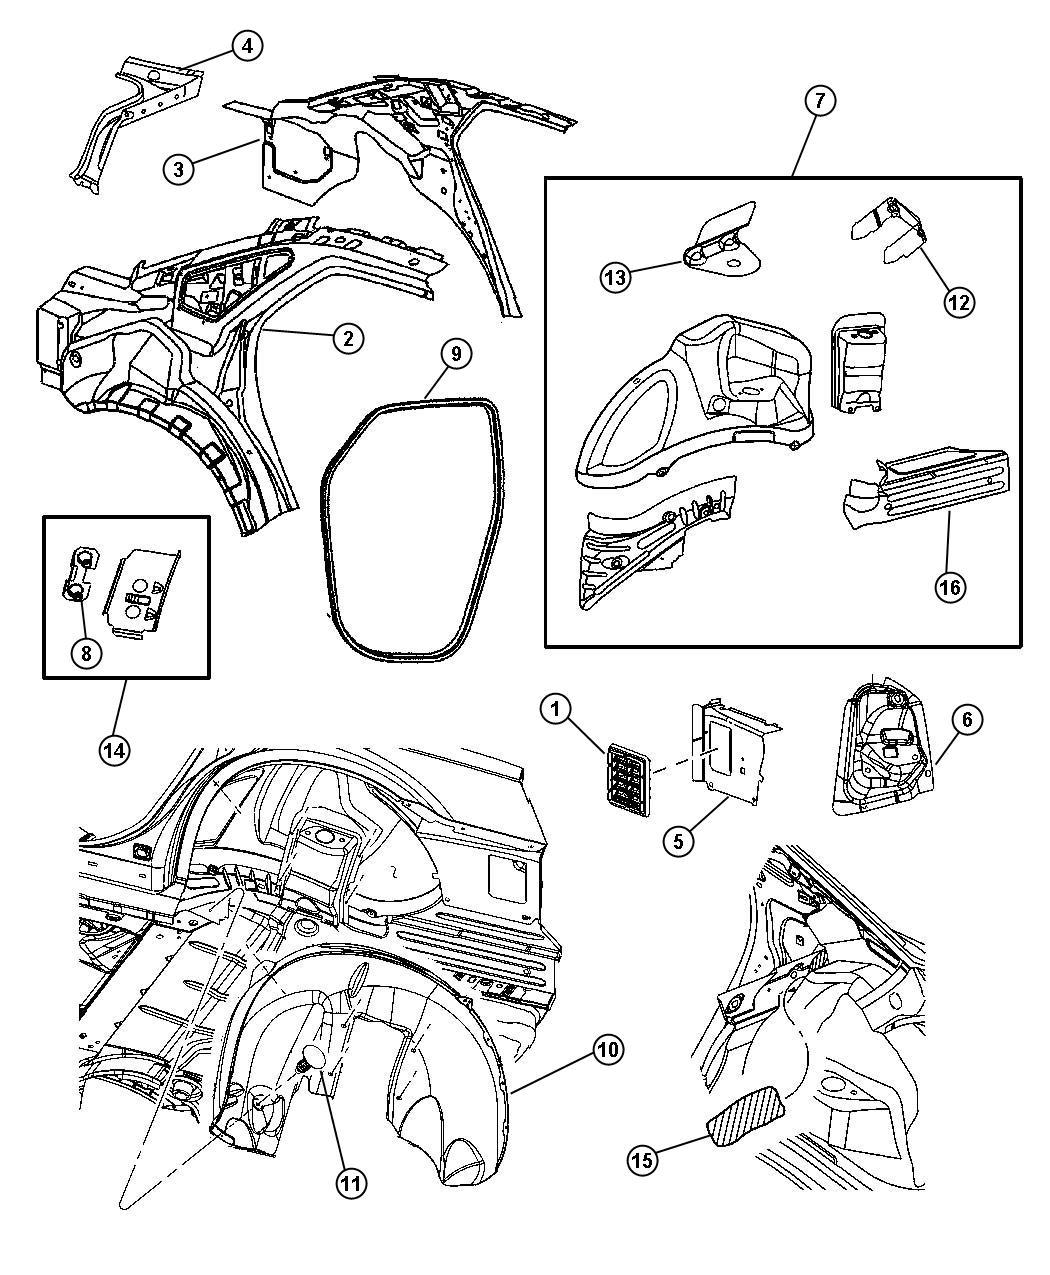 2007 Dodge Pin. Push in. M8 x 1.25 x 20. Fascia attaching